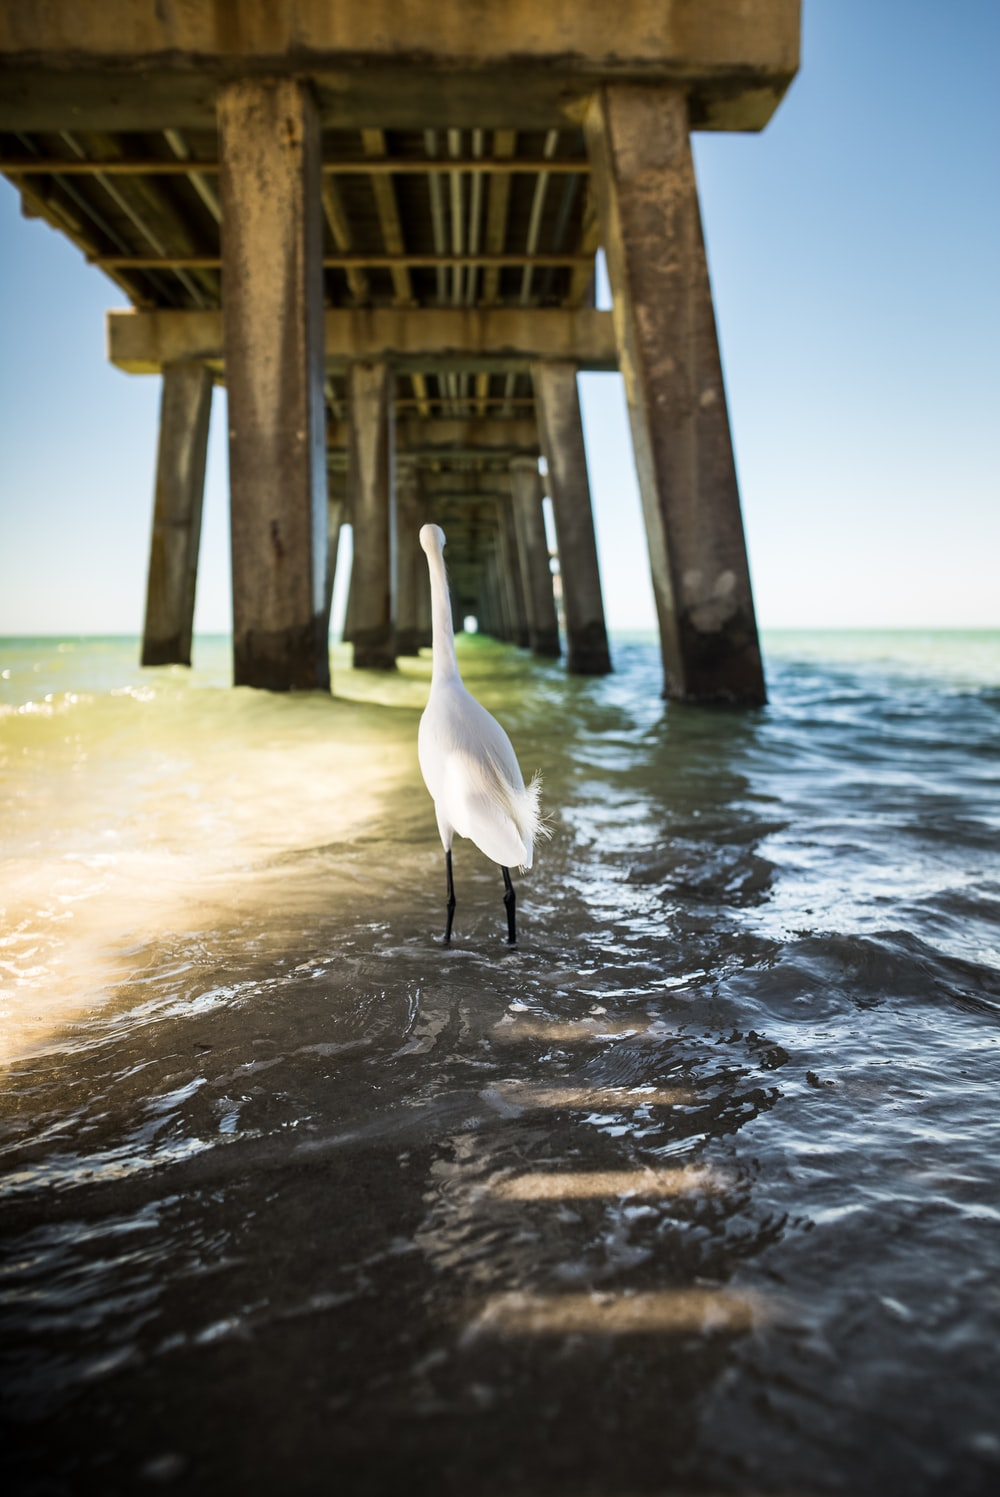 white bird standing on body of water under brown wooden port